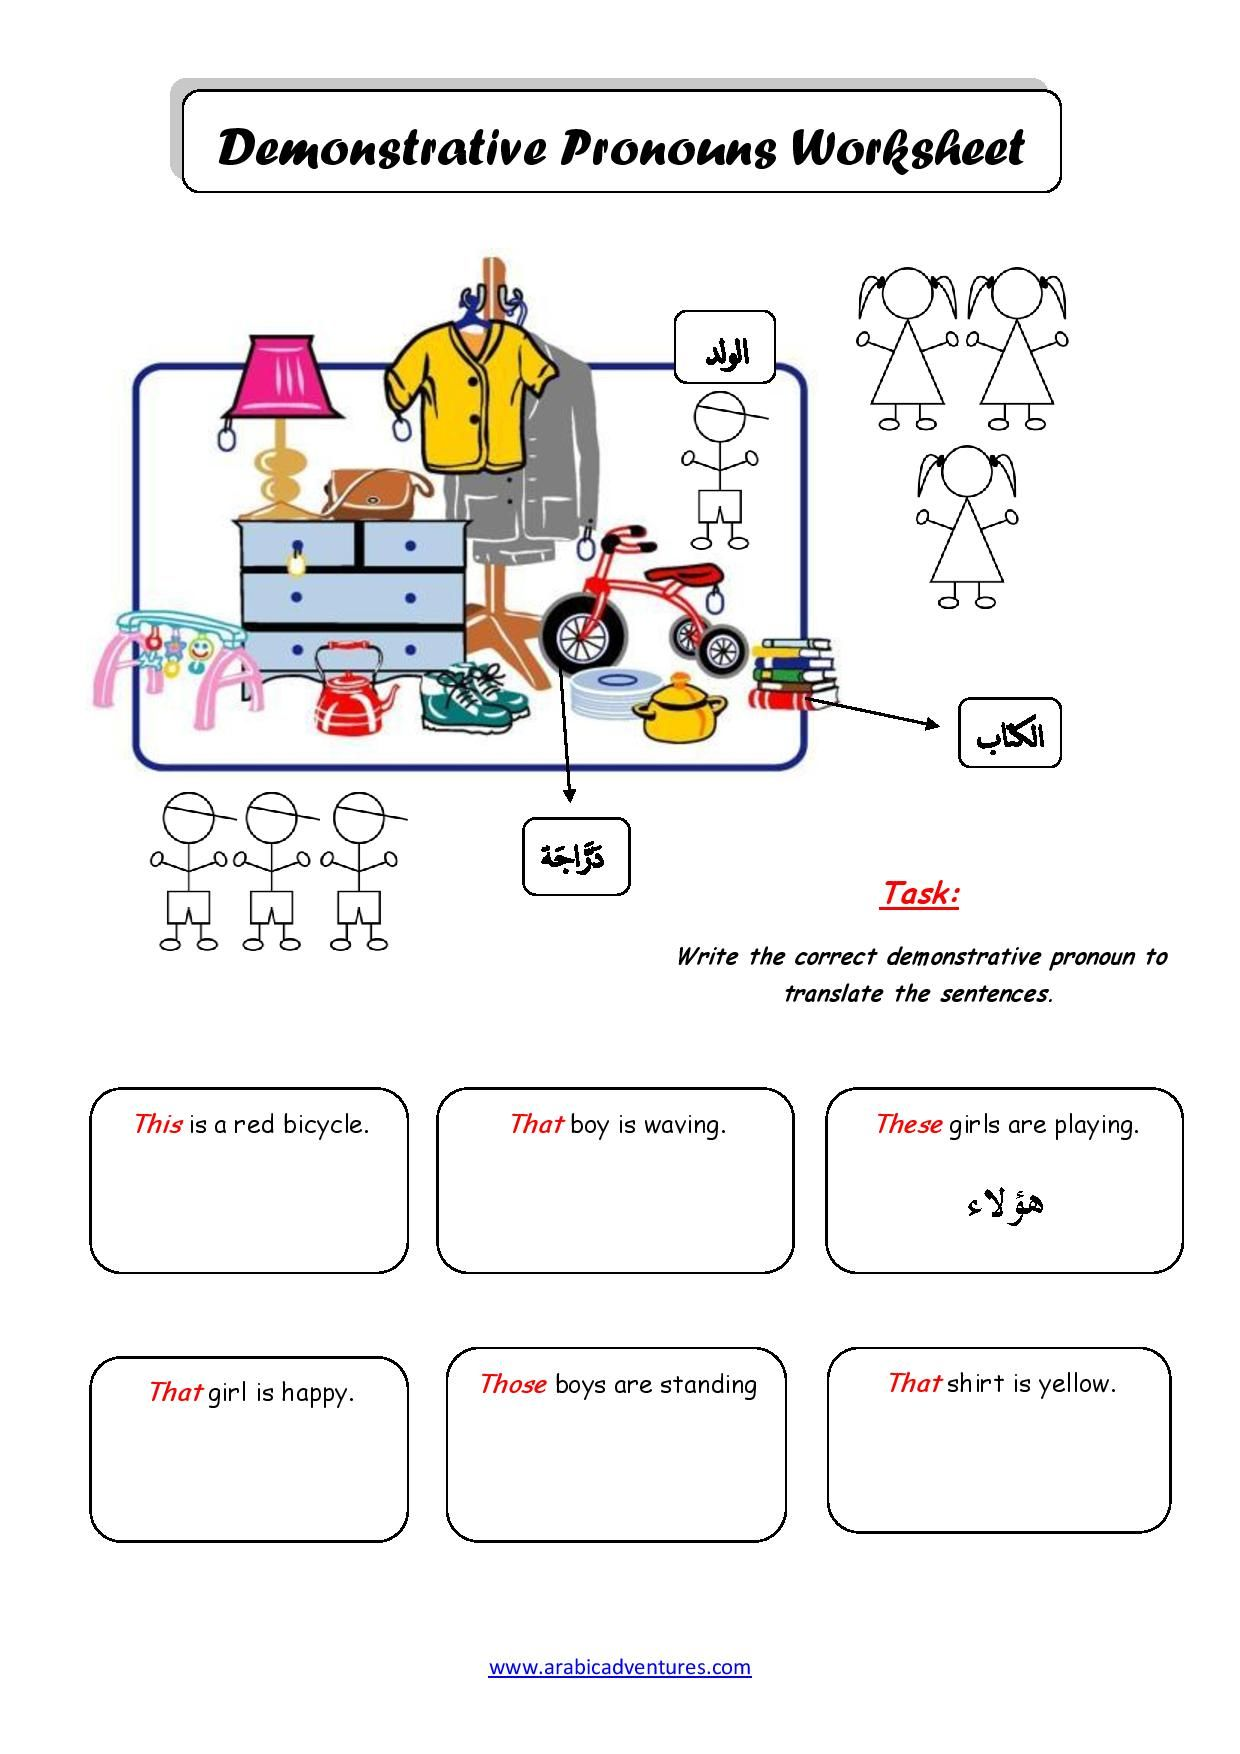 Arabic Demonstrative pronoun worksheet. Free printable at  www.arabicadventures.com   Pronoun worksheets [ 1754 x 1240 Pixel ]